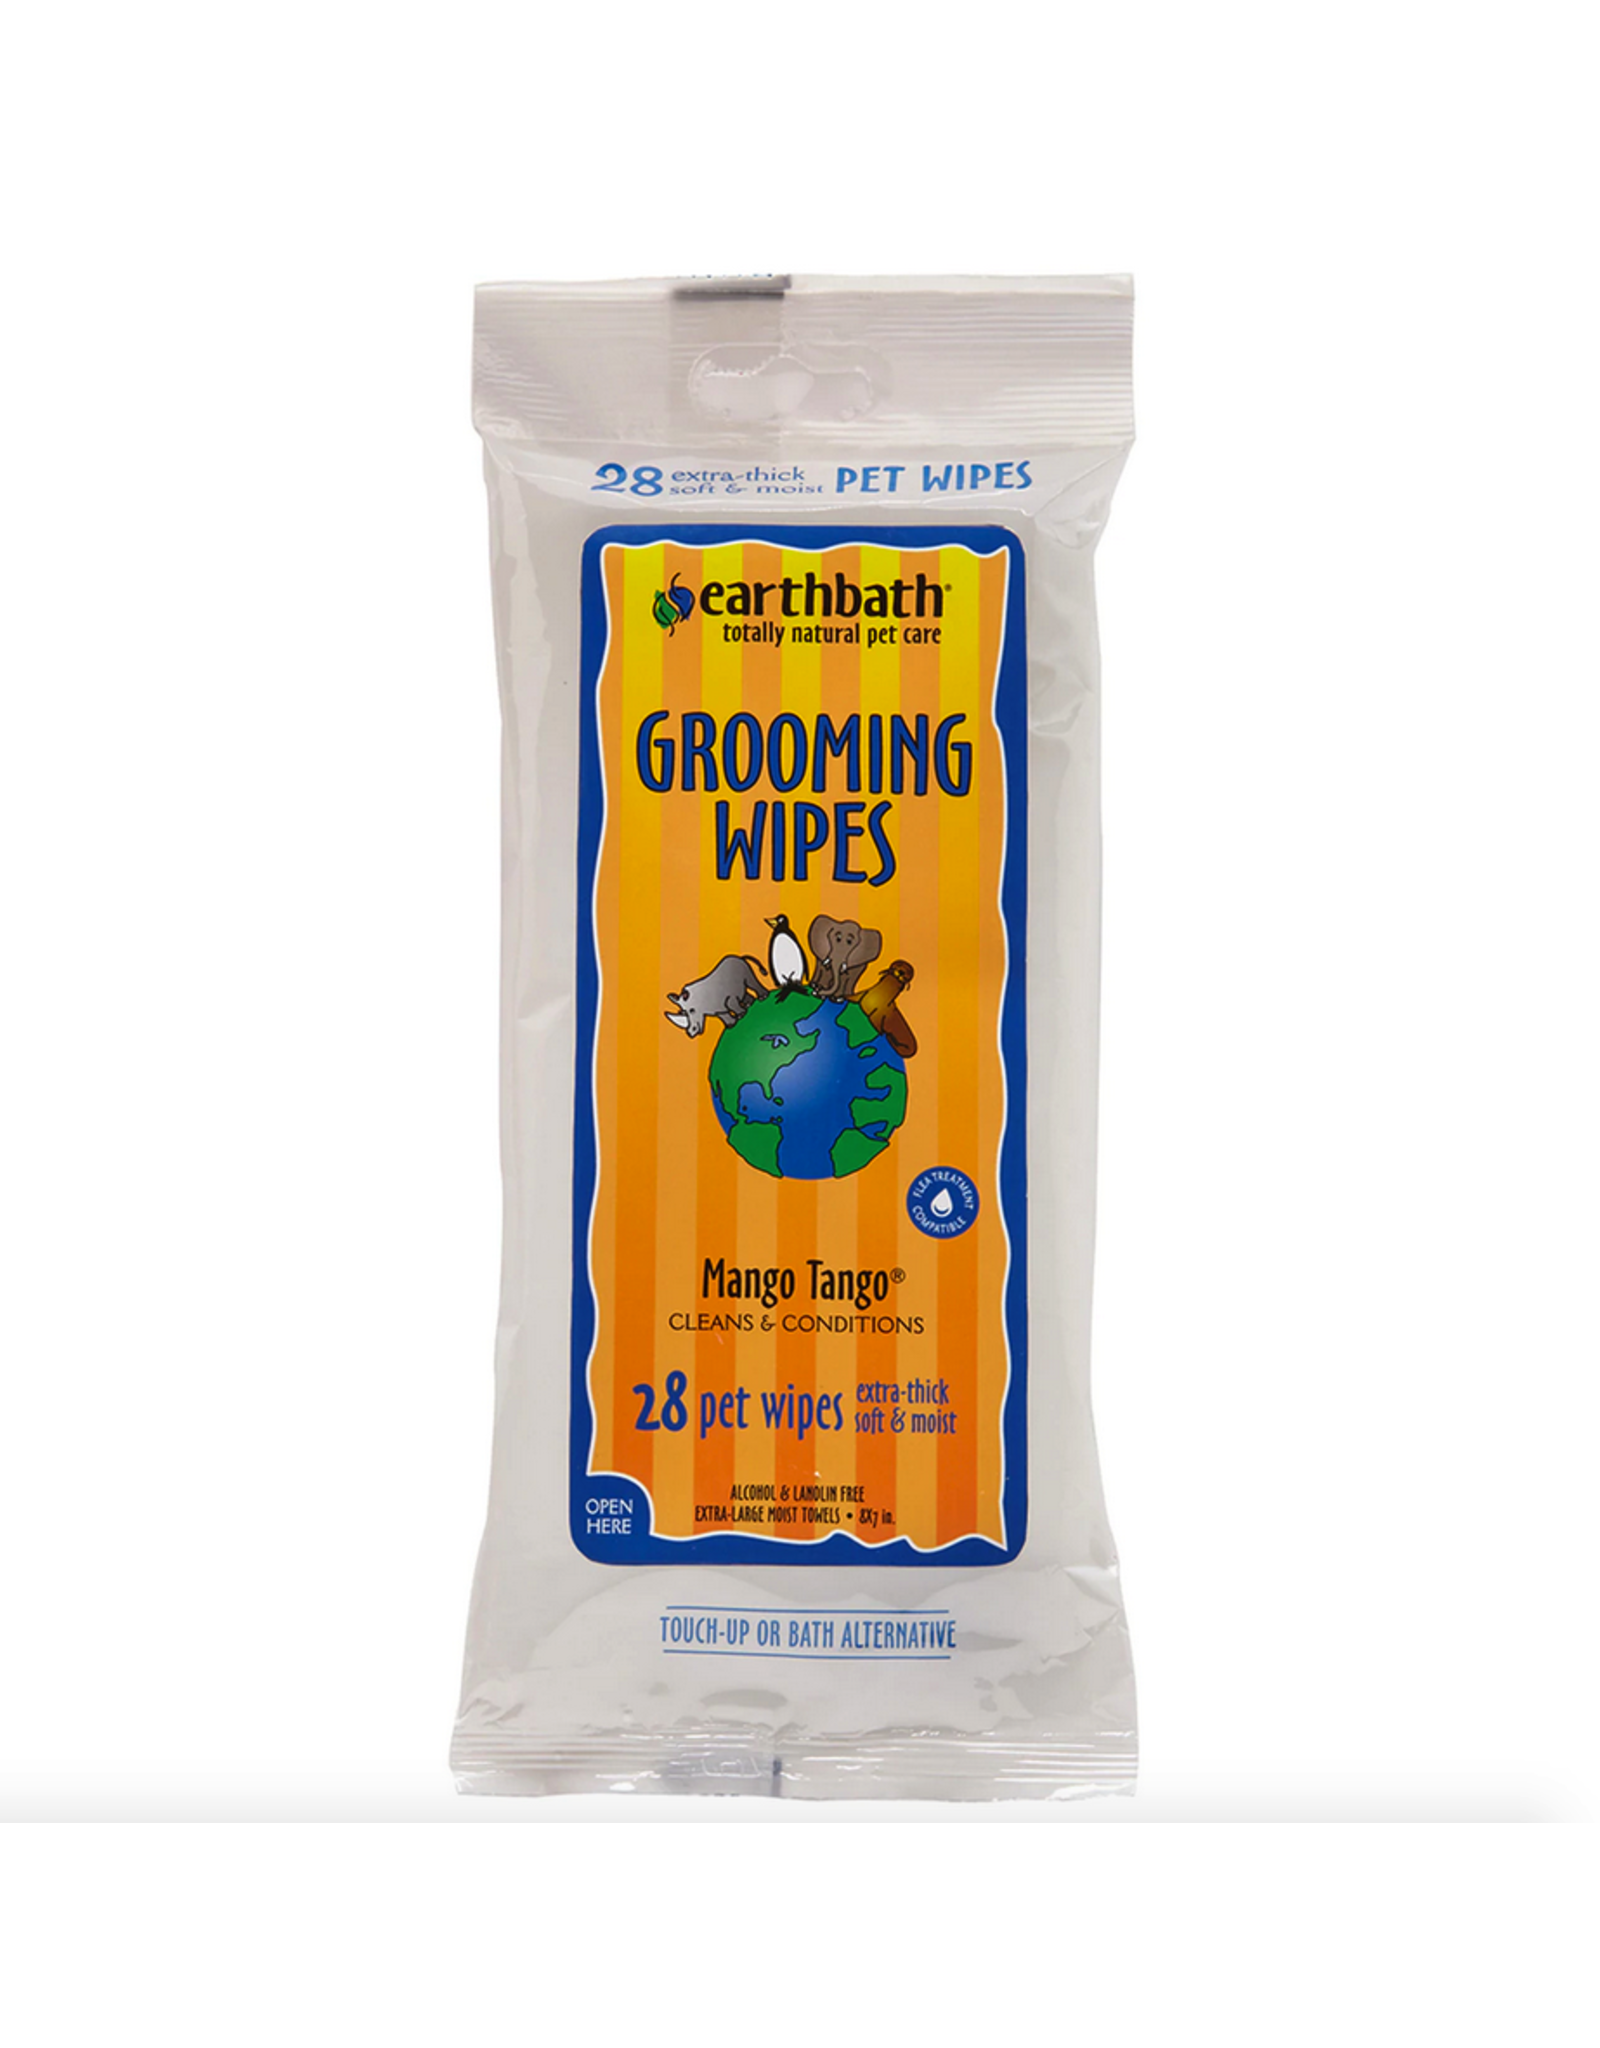 Earthbath Earthbath Grooming Wipes Mango Tango 28ct